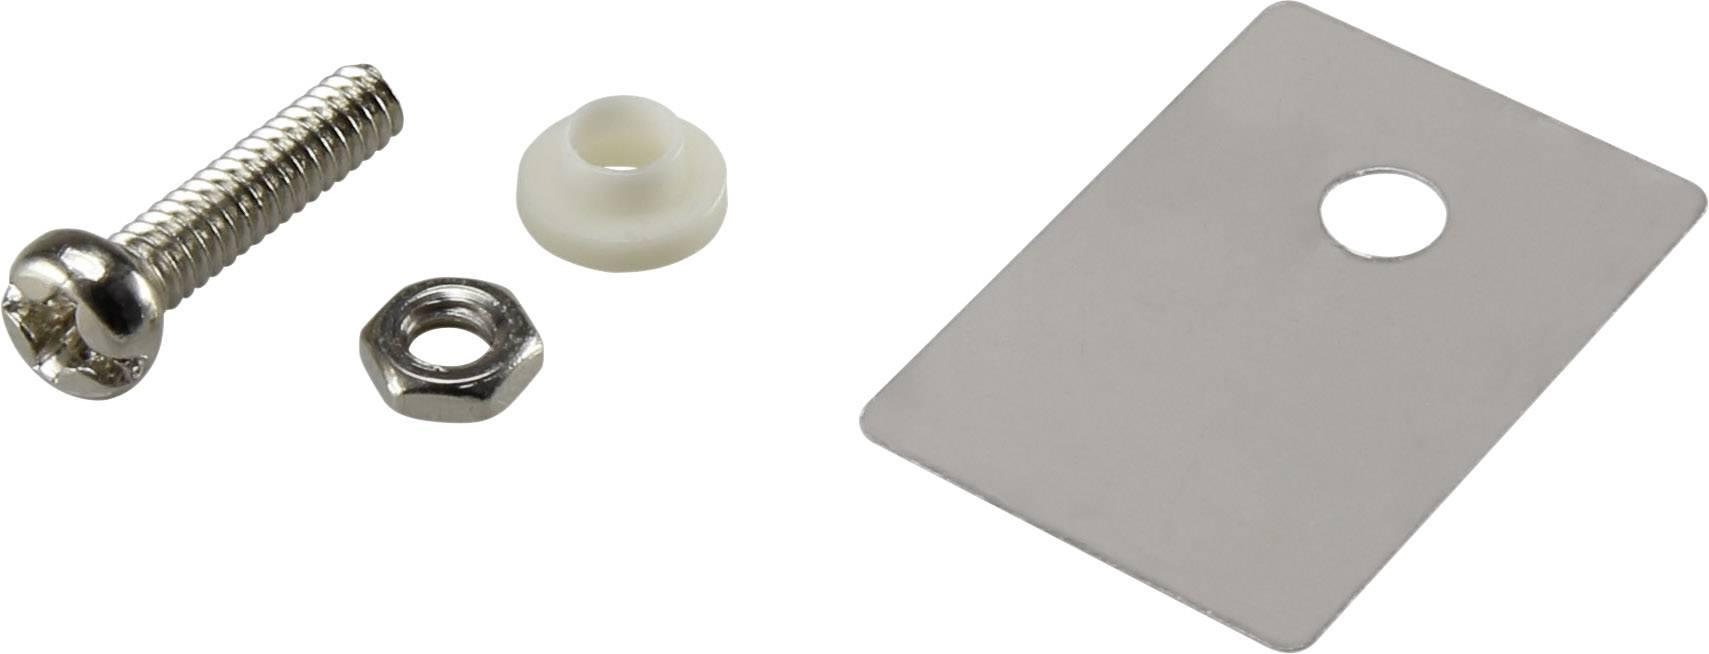 Sada montážneho materiálu pre polovodiče TRU COMPONENTS TC-A18-10D, (d x š) 22.3 mm x 15.2 mm, 1 sada